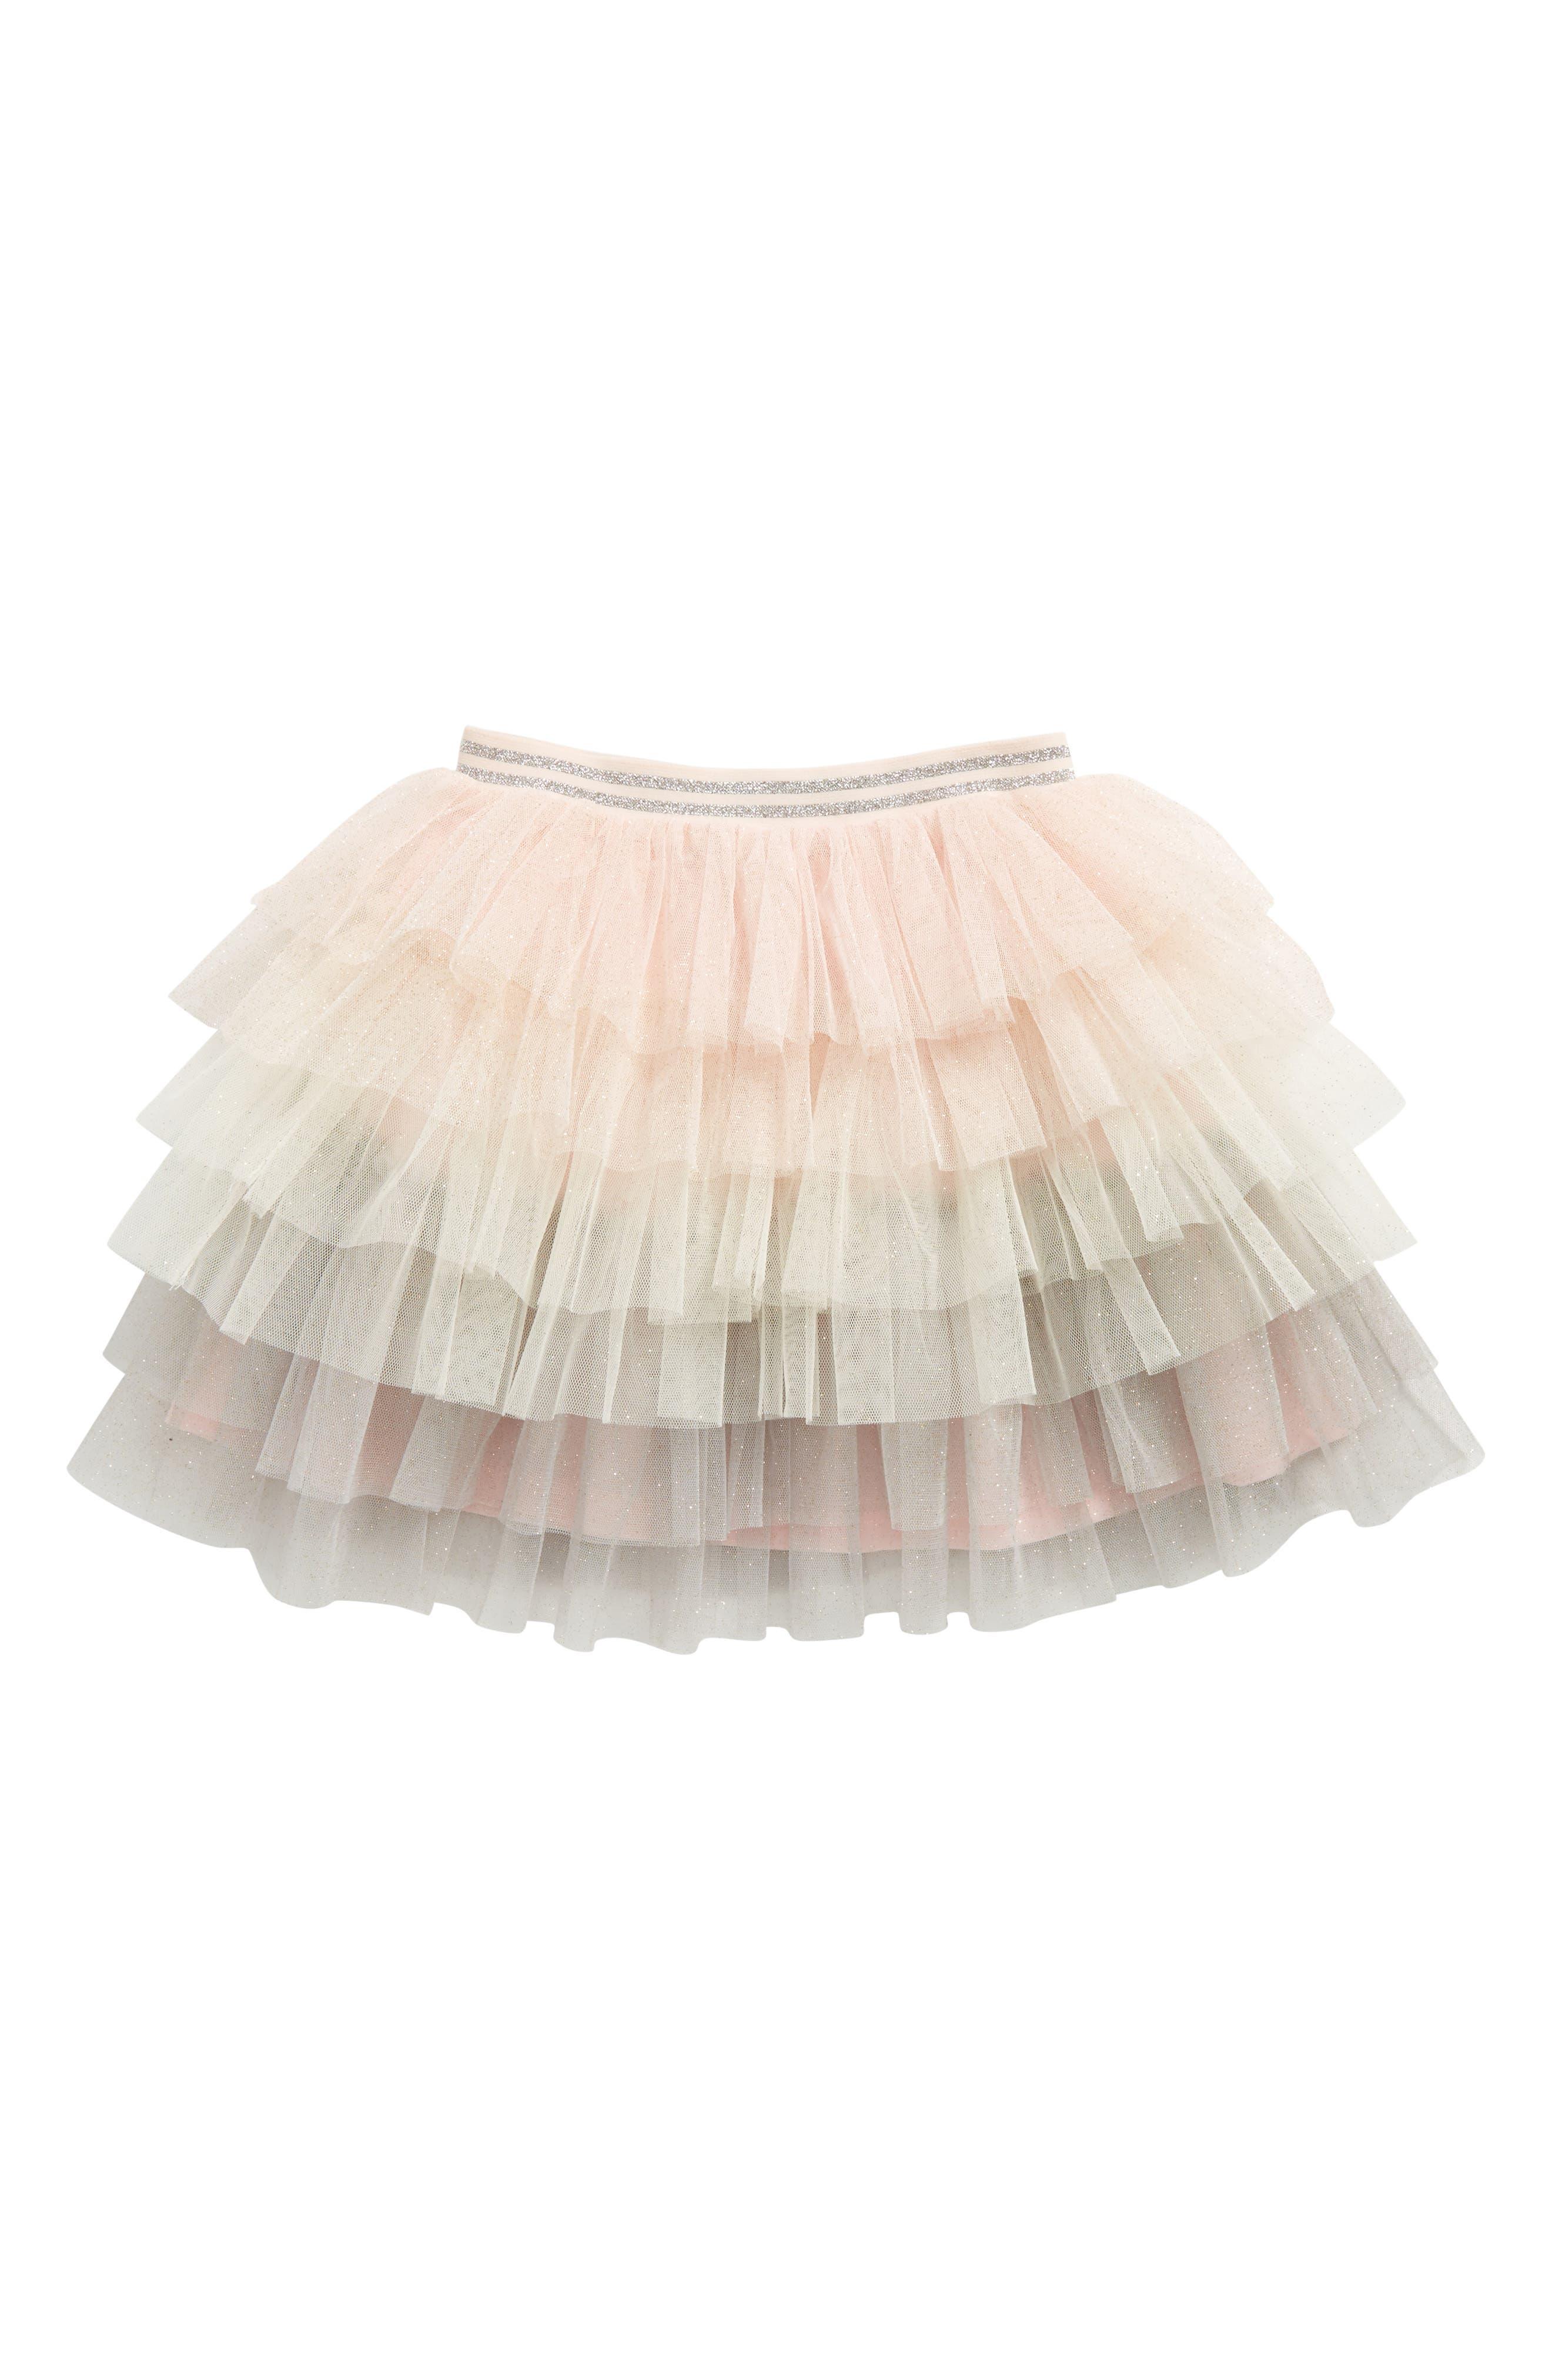 Tiered Tutu Skirt,                             Main thumbnail 1, color,                             651